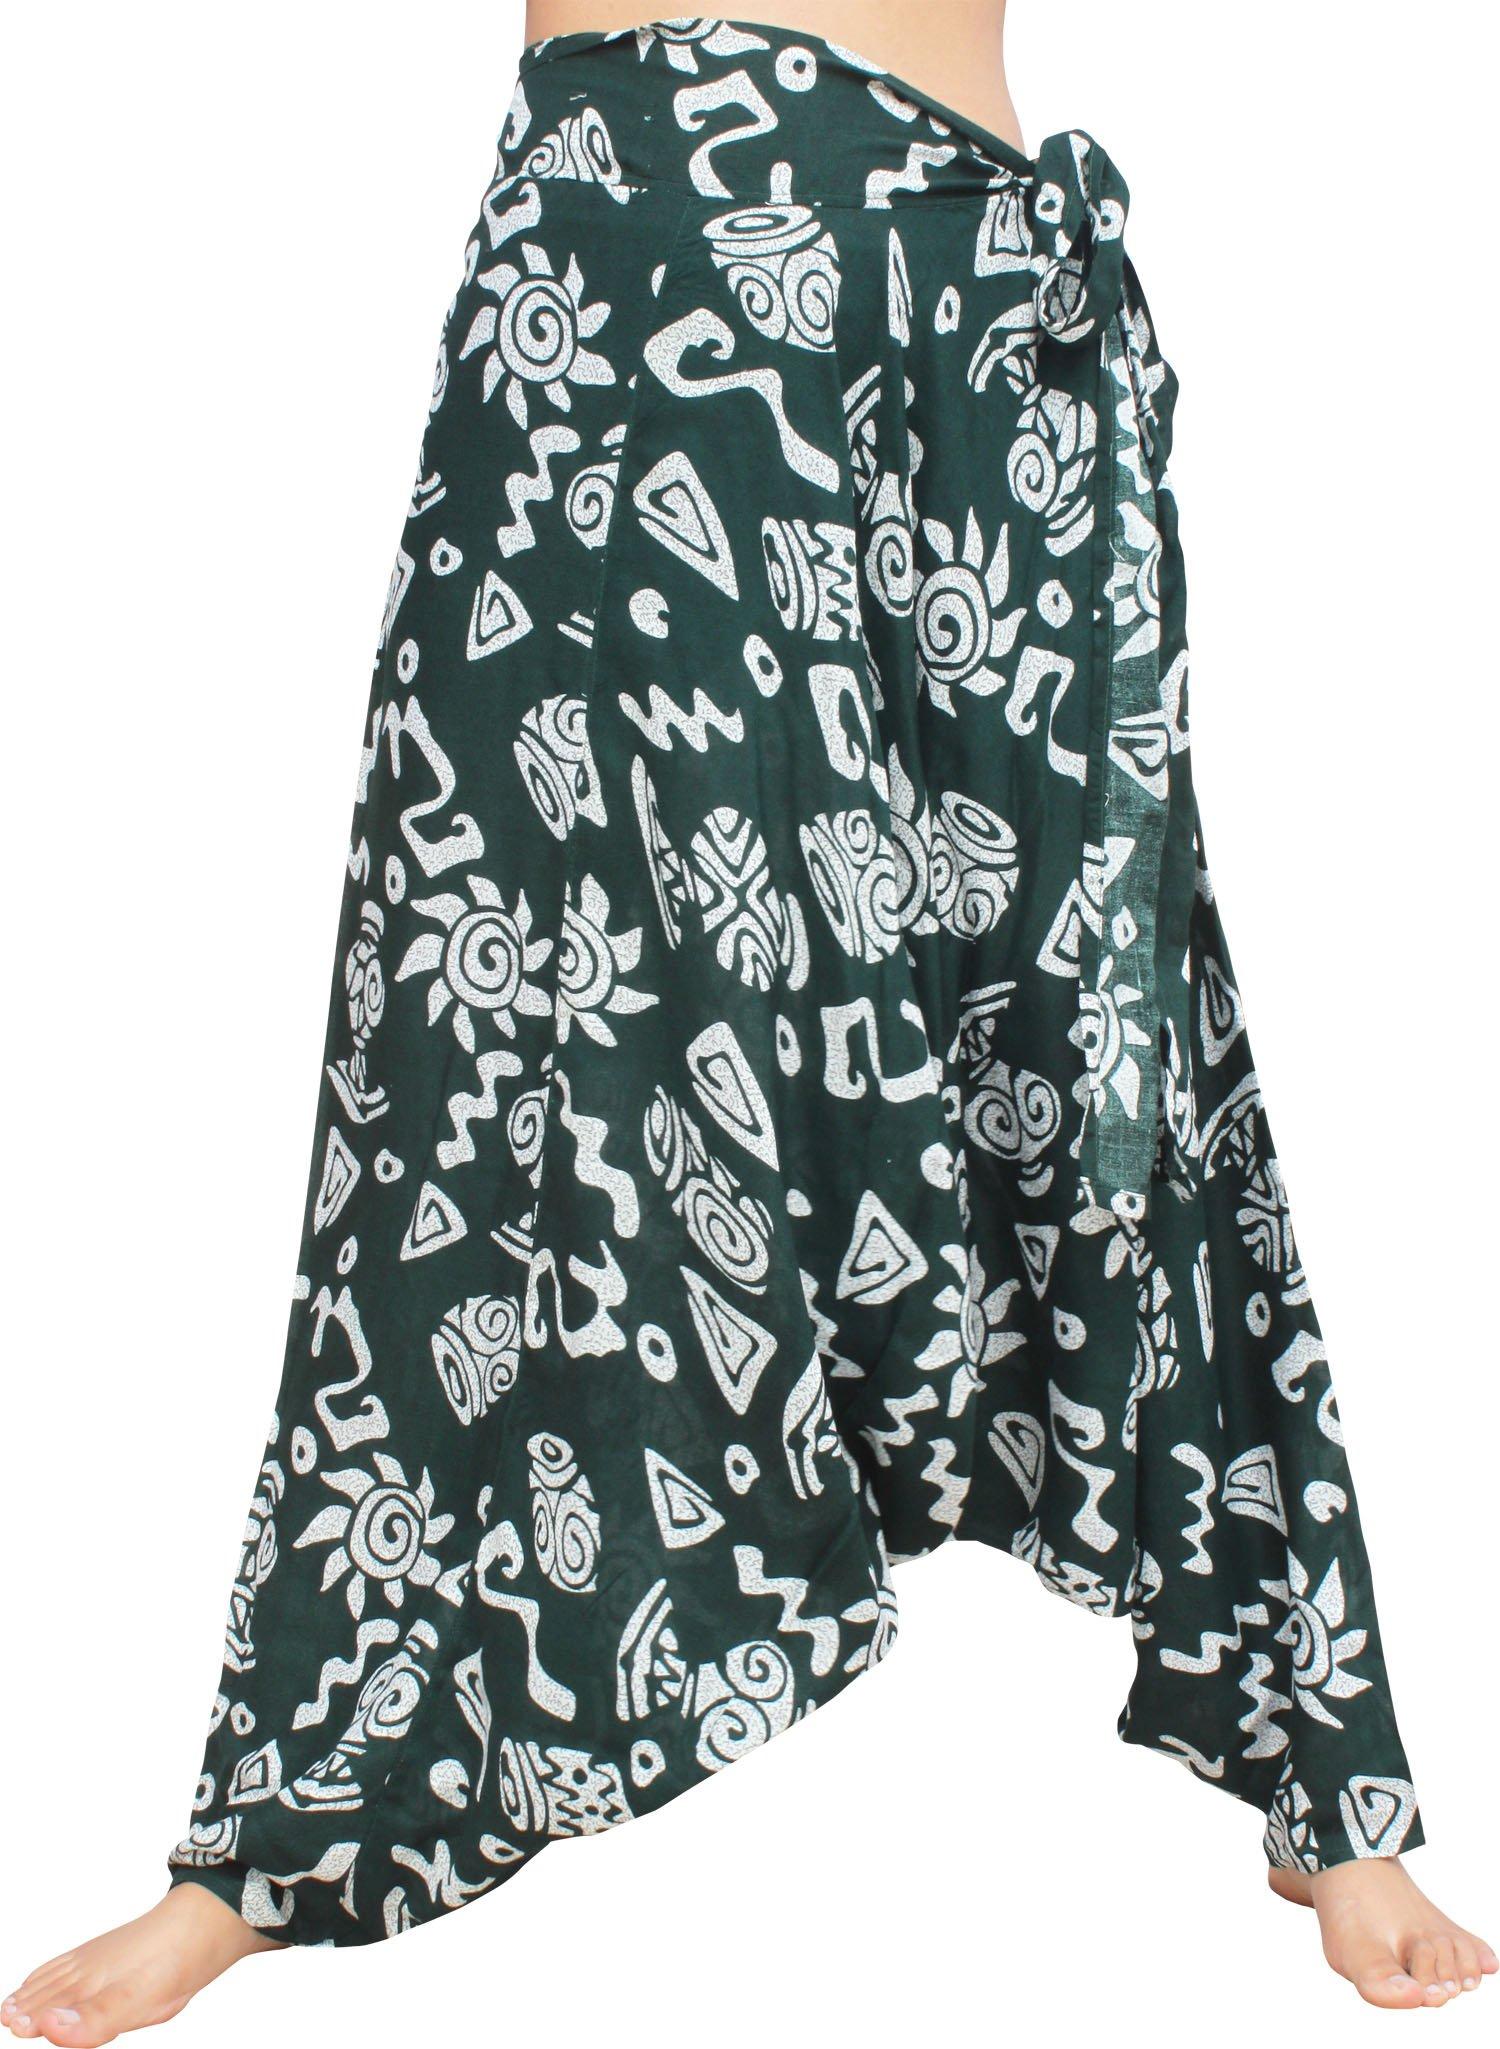 Raan Pah Muang Geometric Art Baggy Side Tie Mao Hmong Hill Tribe Harem Pants, Medium, Dark Green by Raan Pah Muang